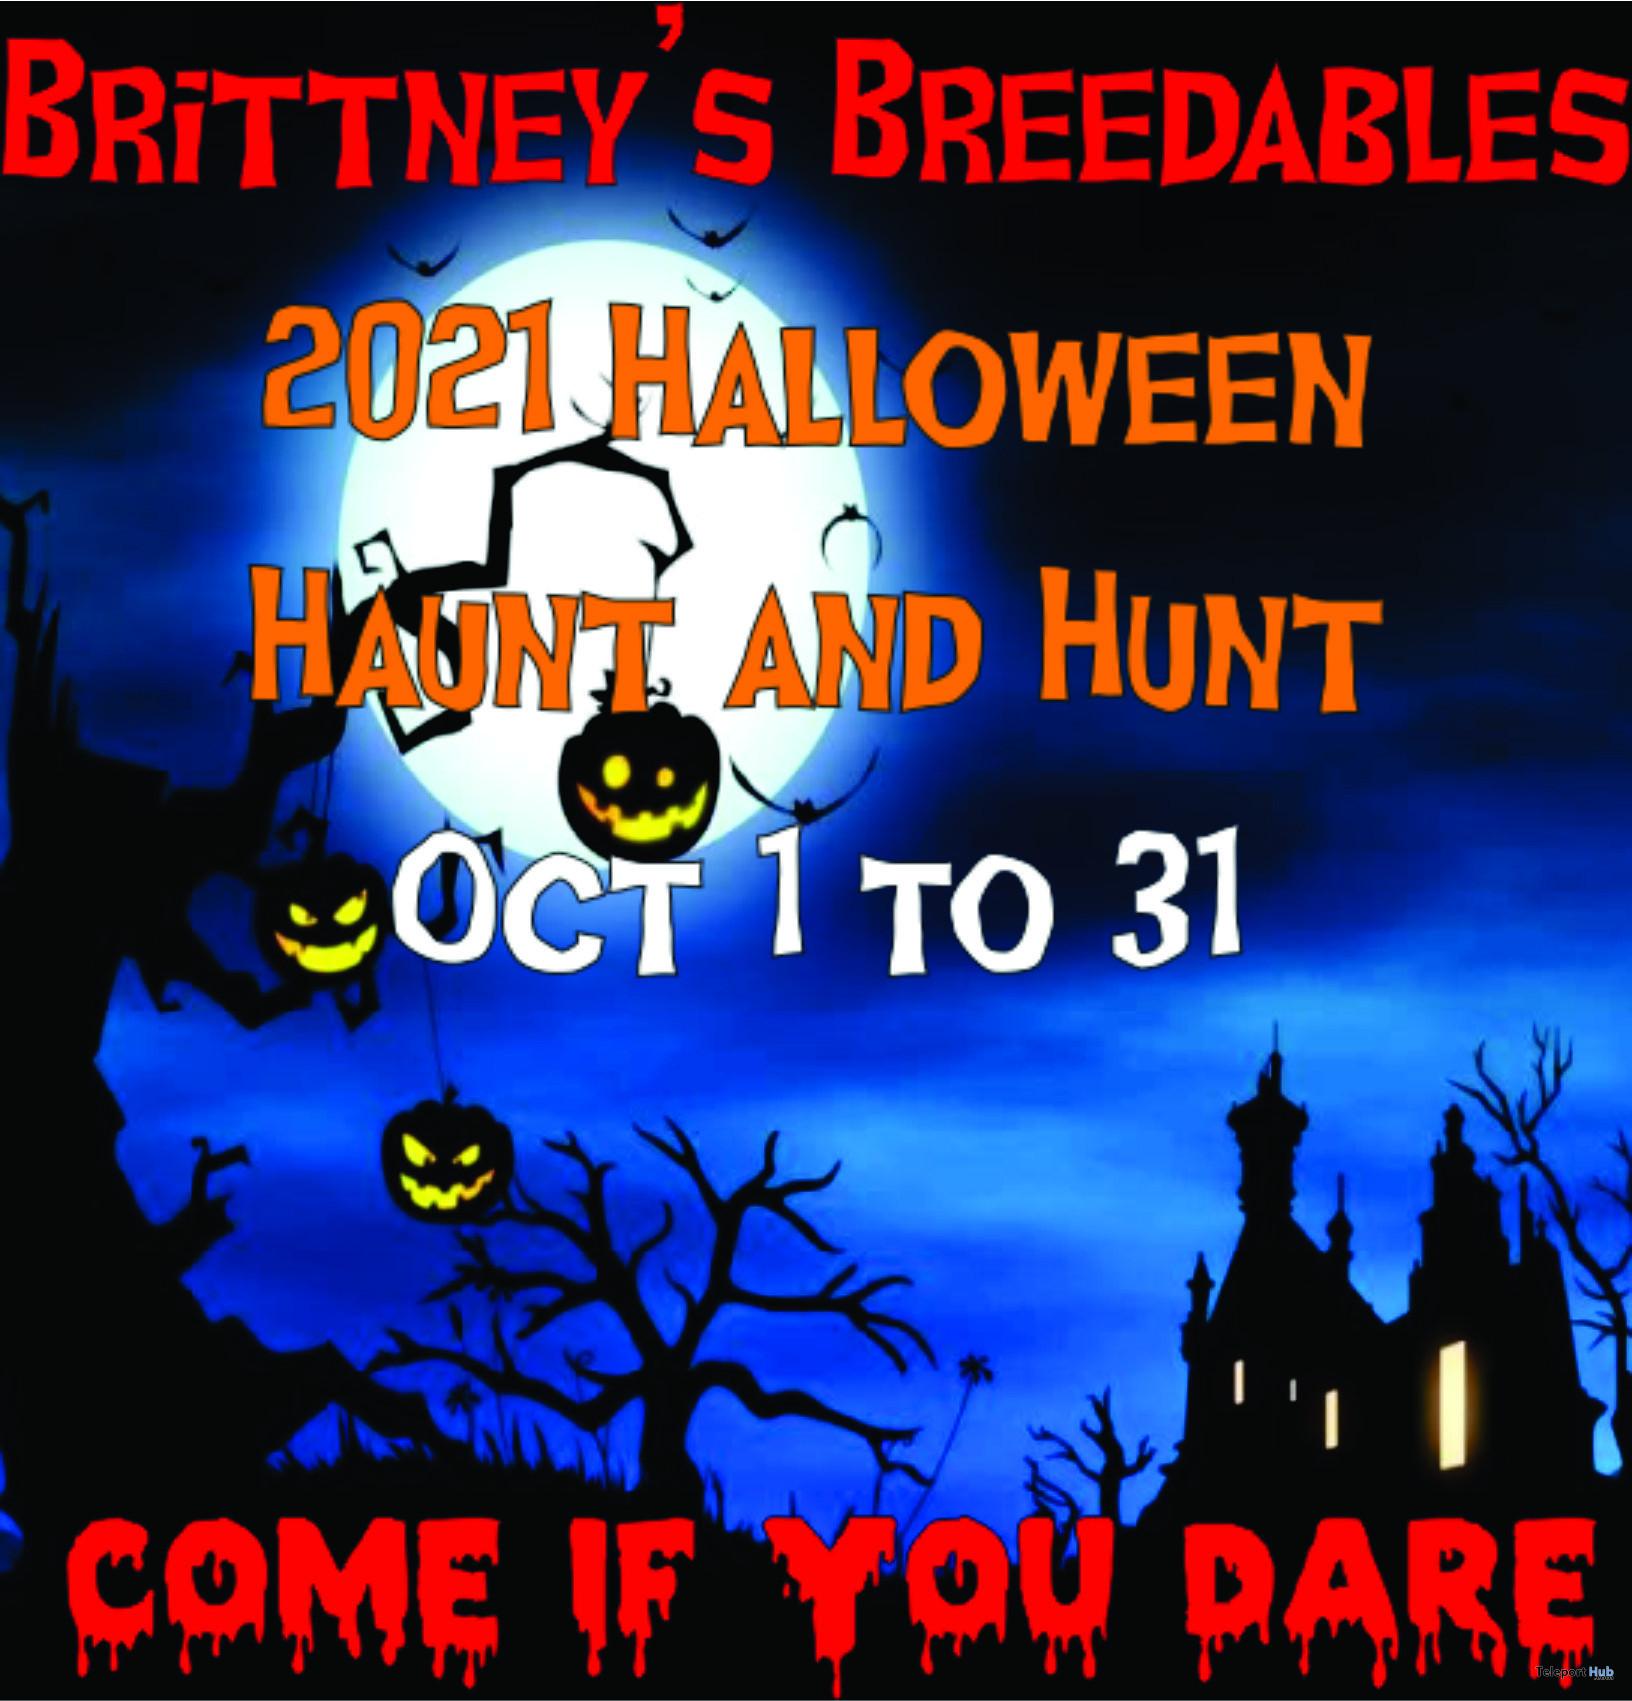 Brittney's Breedables Halloween Haunt & Hunt 2021 - Teleport Hub - teleporthub.com